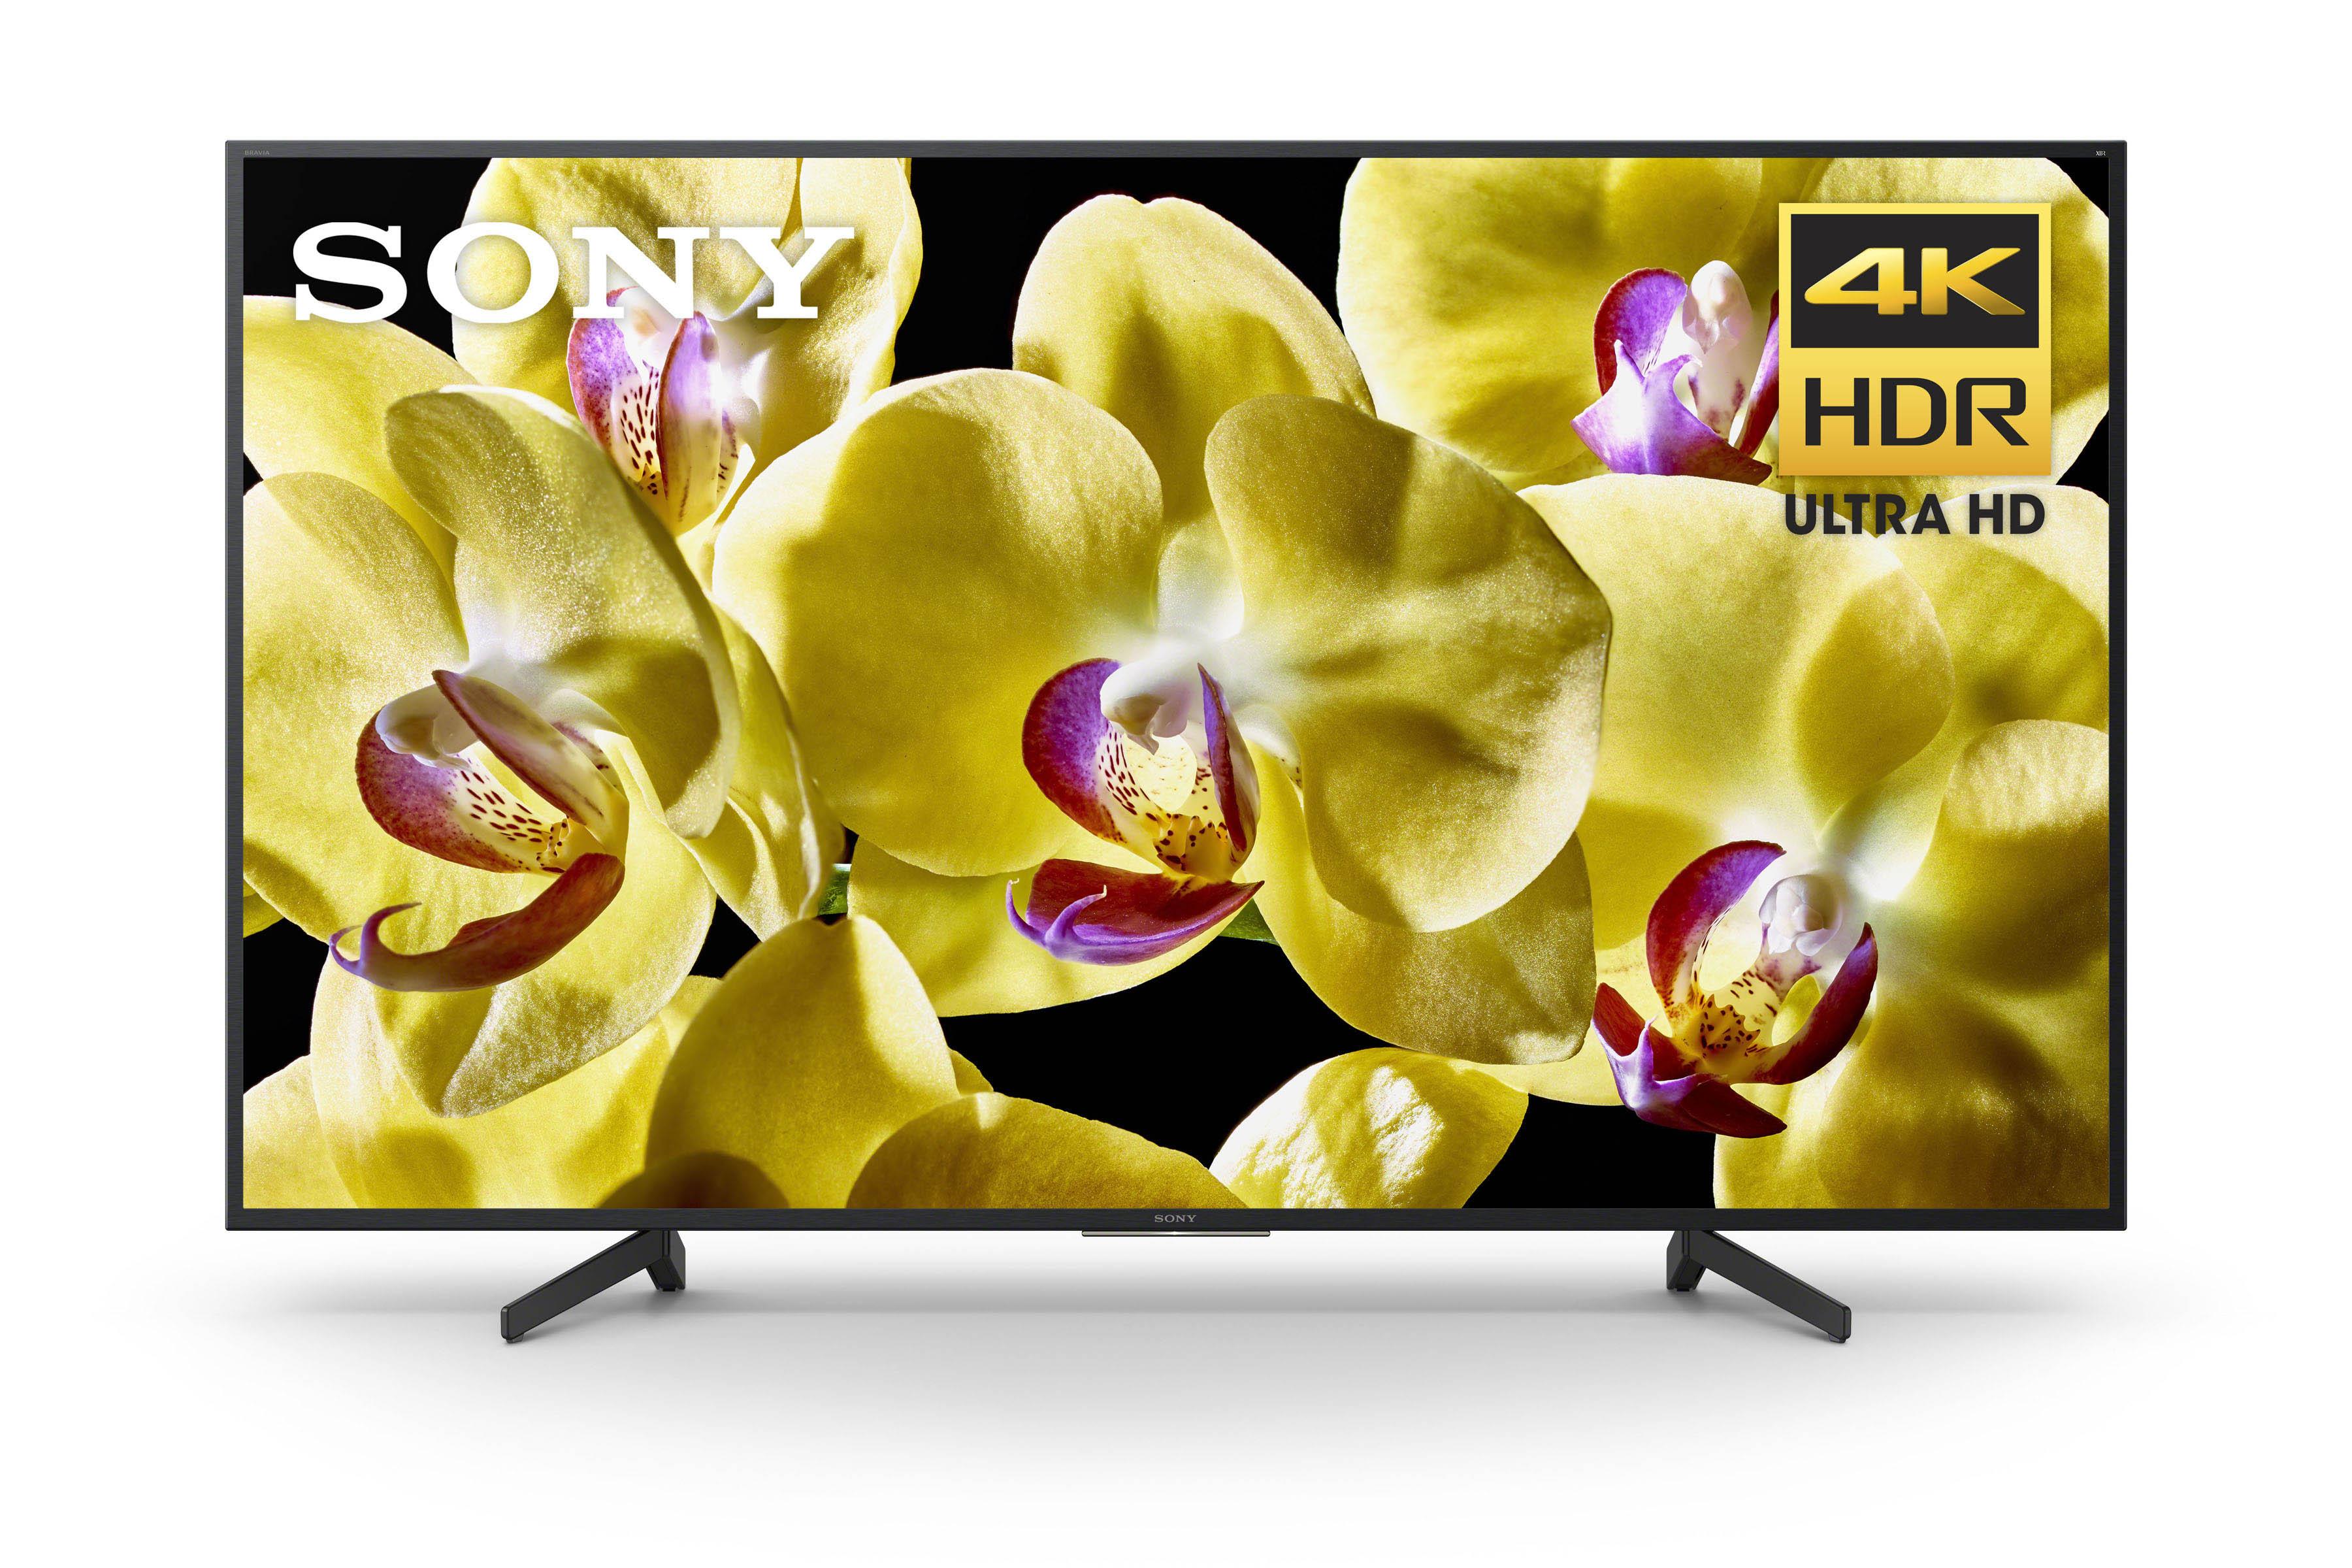 "Walmart Sony 55"" Class 4K UHD LED Android Smart TV HDR BRAVIA 800G Series XBR55X800G  $360.81"